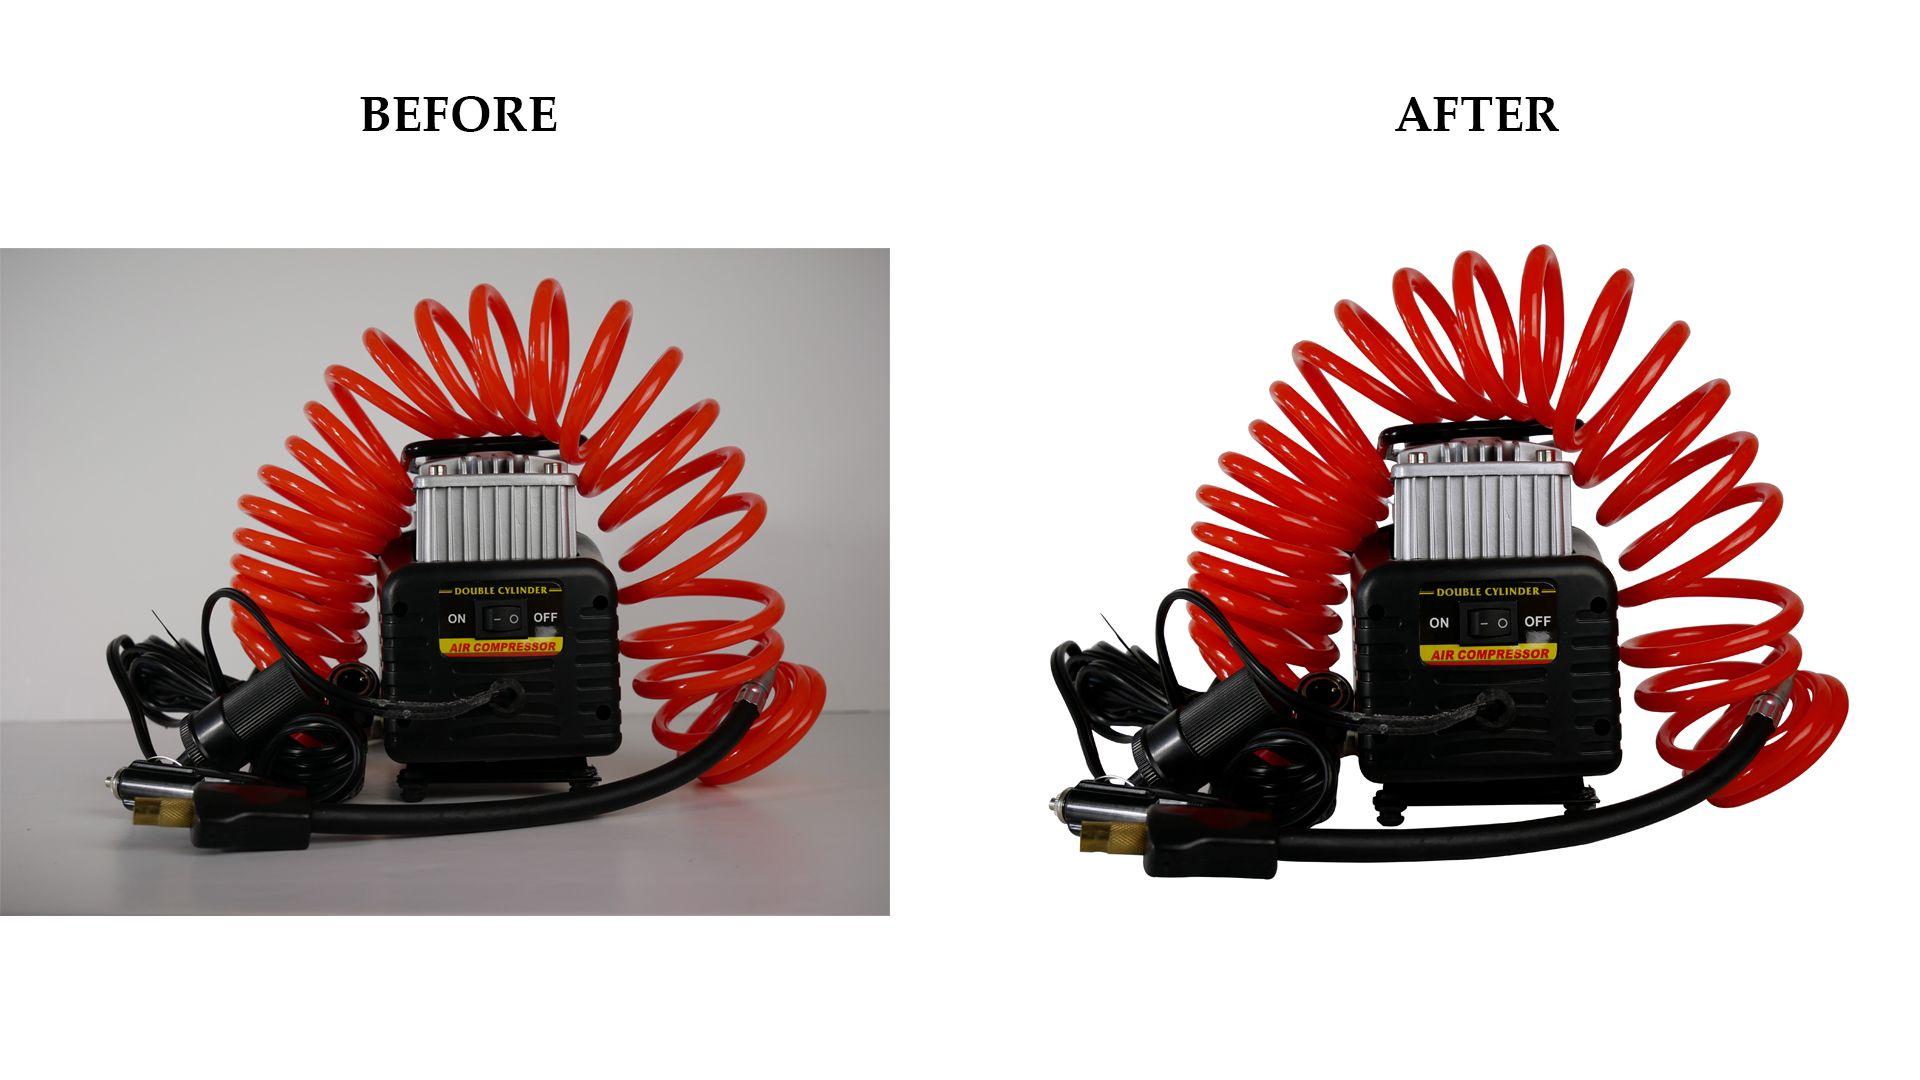 Photo editing service remove white background Color change